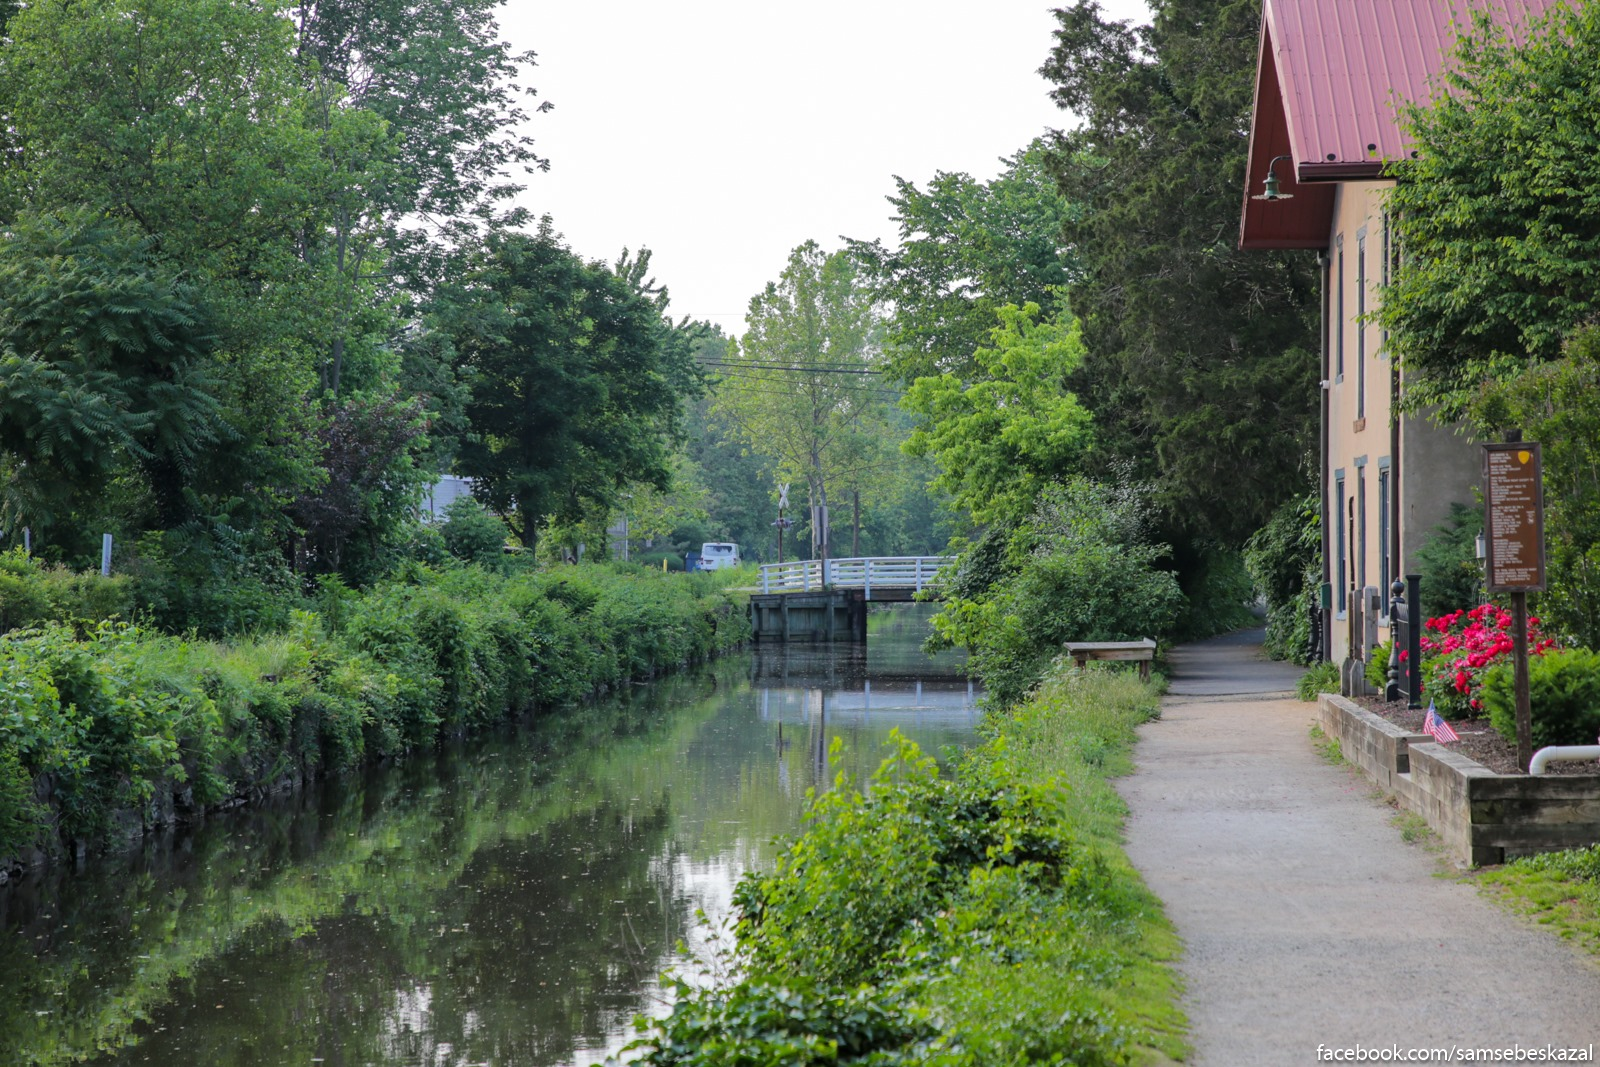 Ruslo kanala zarossee kustarnikom.